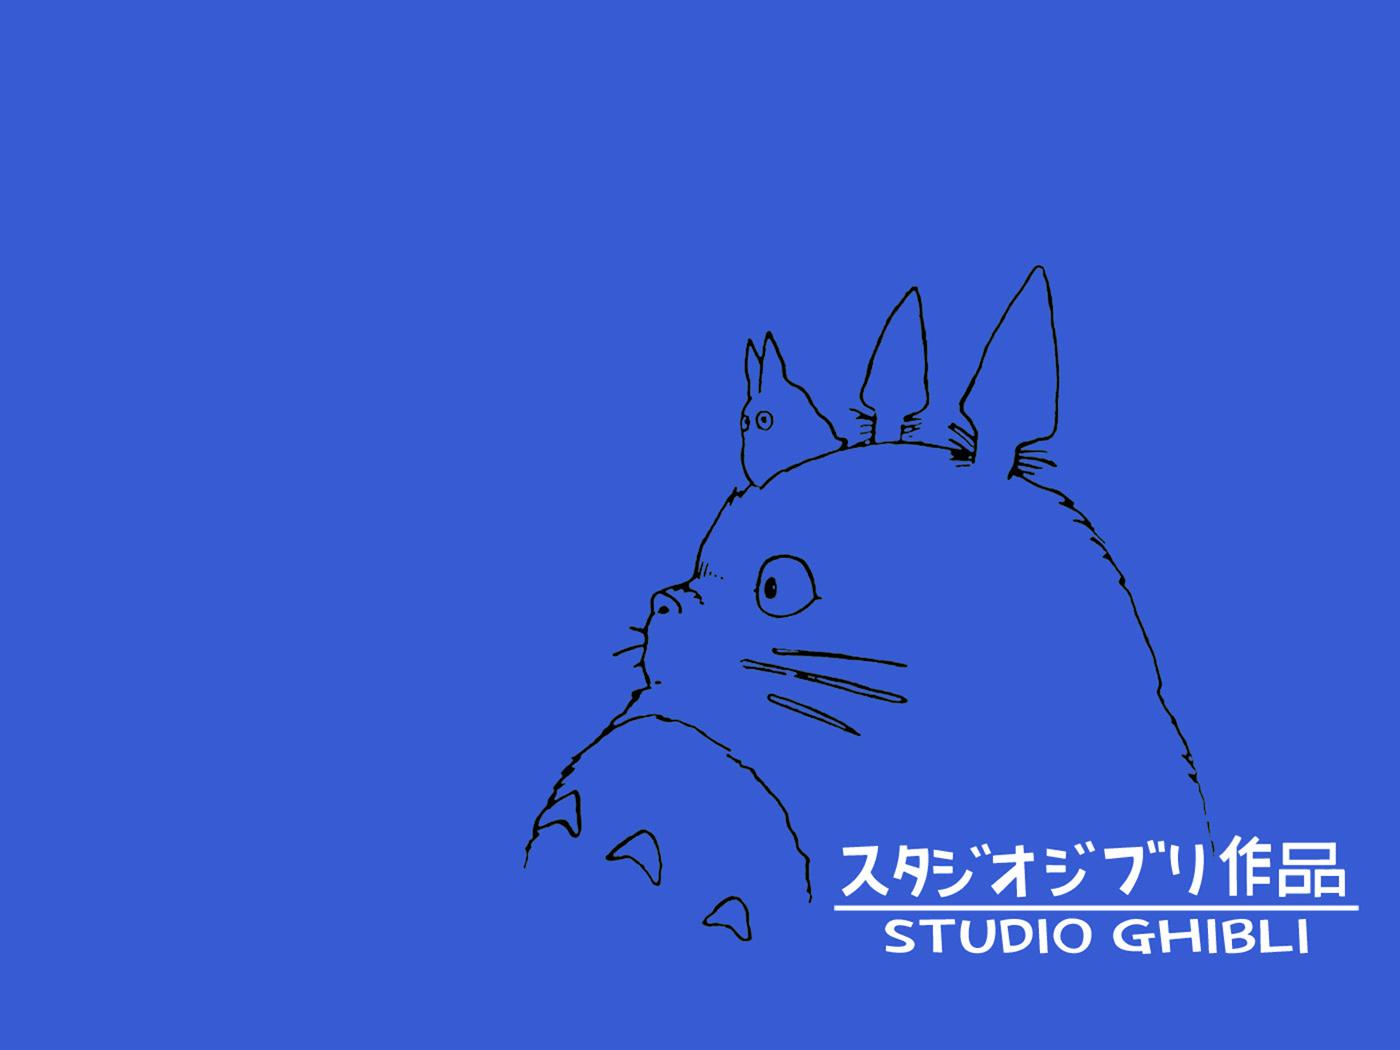 Studio Ghibli Wallpaper 1400x1050 Studio Ghibli 1400x1050